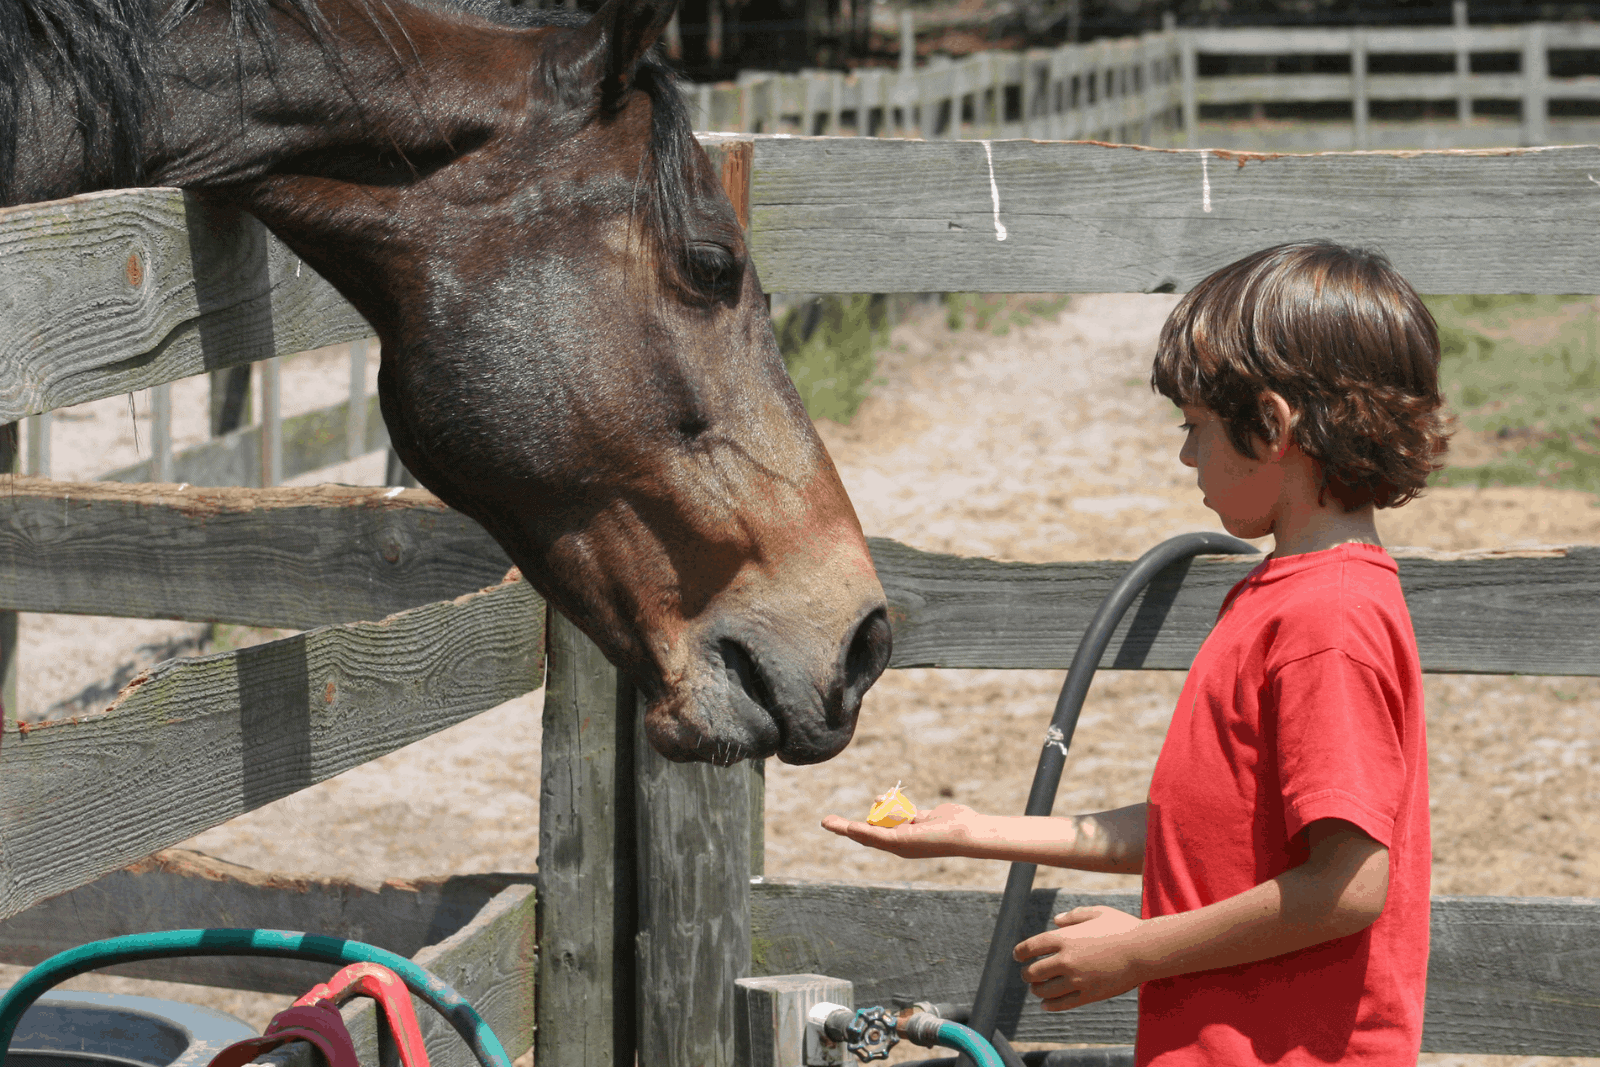 a little boy feeding a brown horse